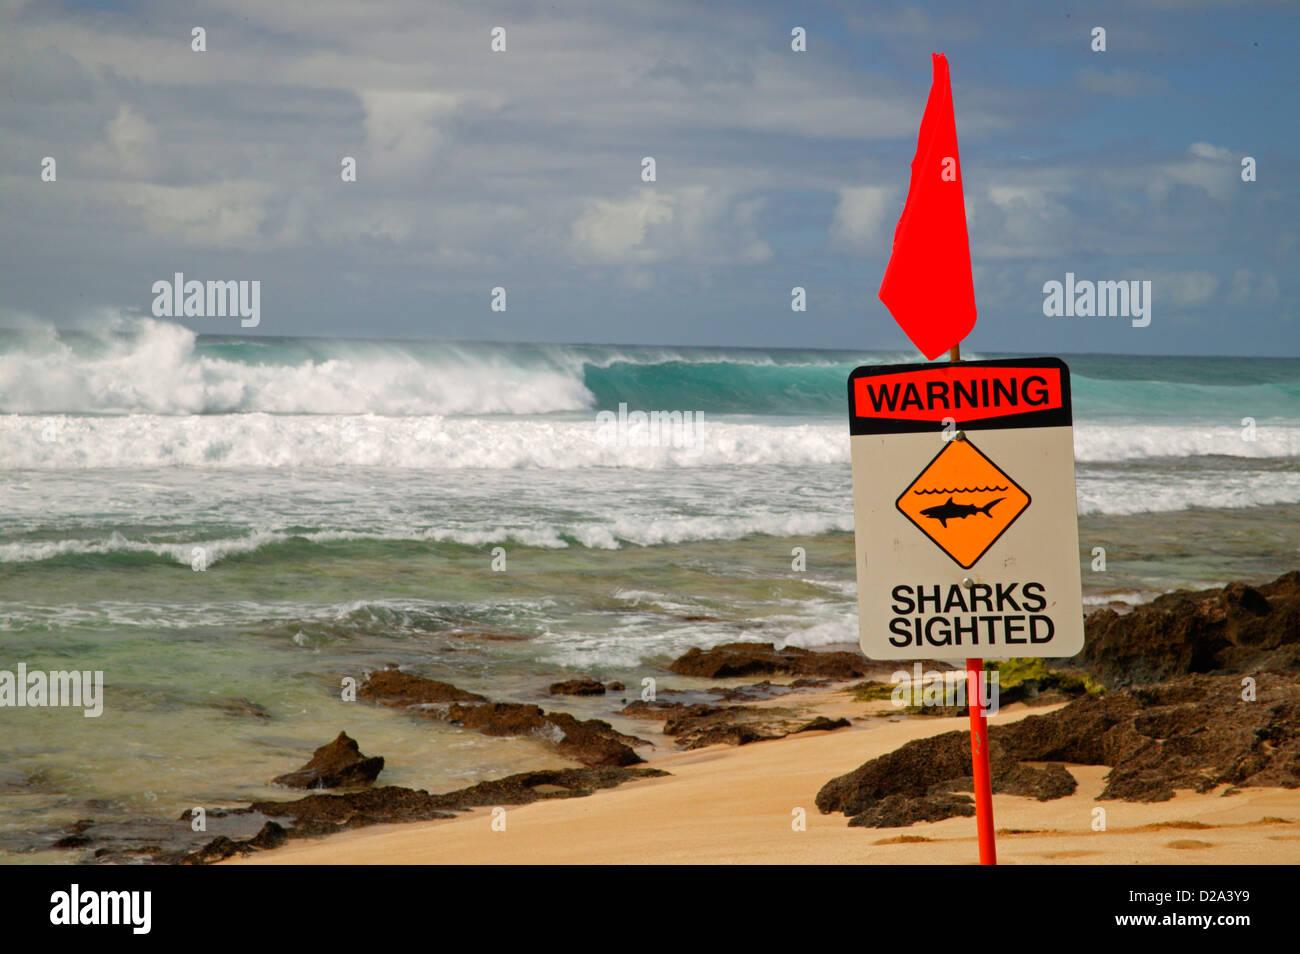 Hawaii, Oahu, North Shore. Shark Sighting Sign - Stock Image